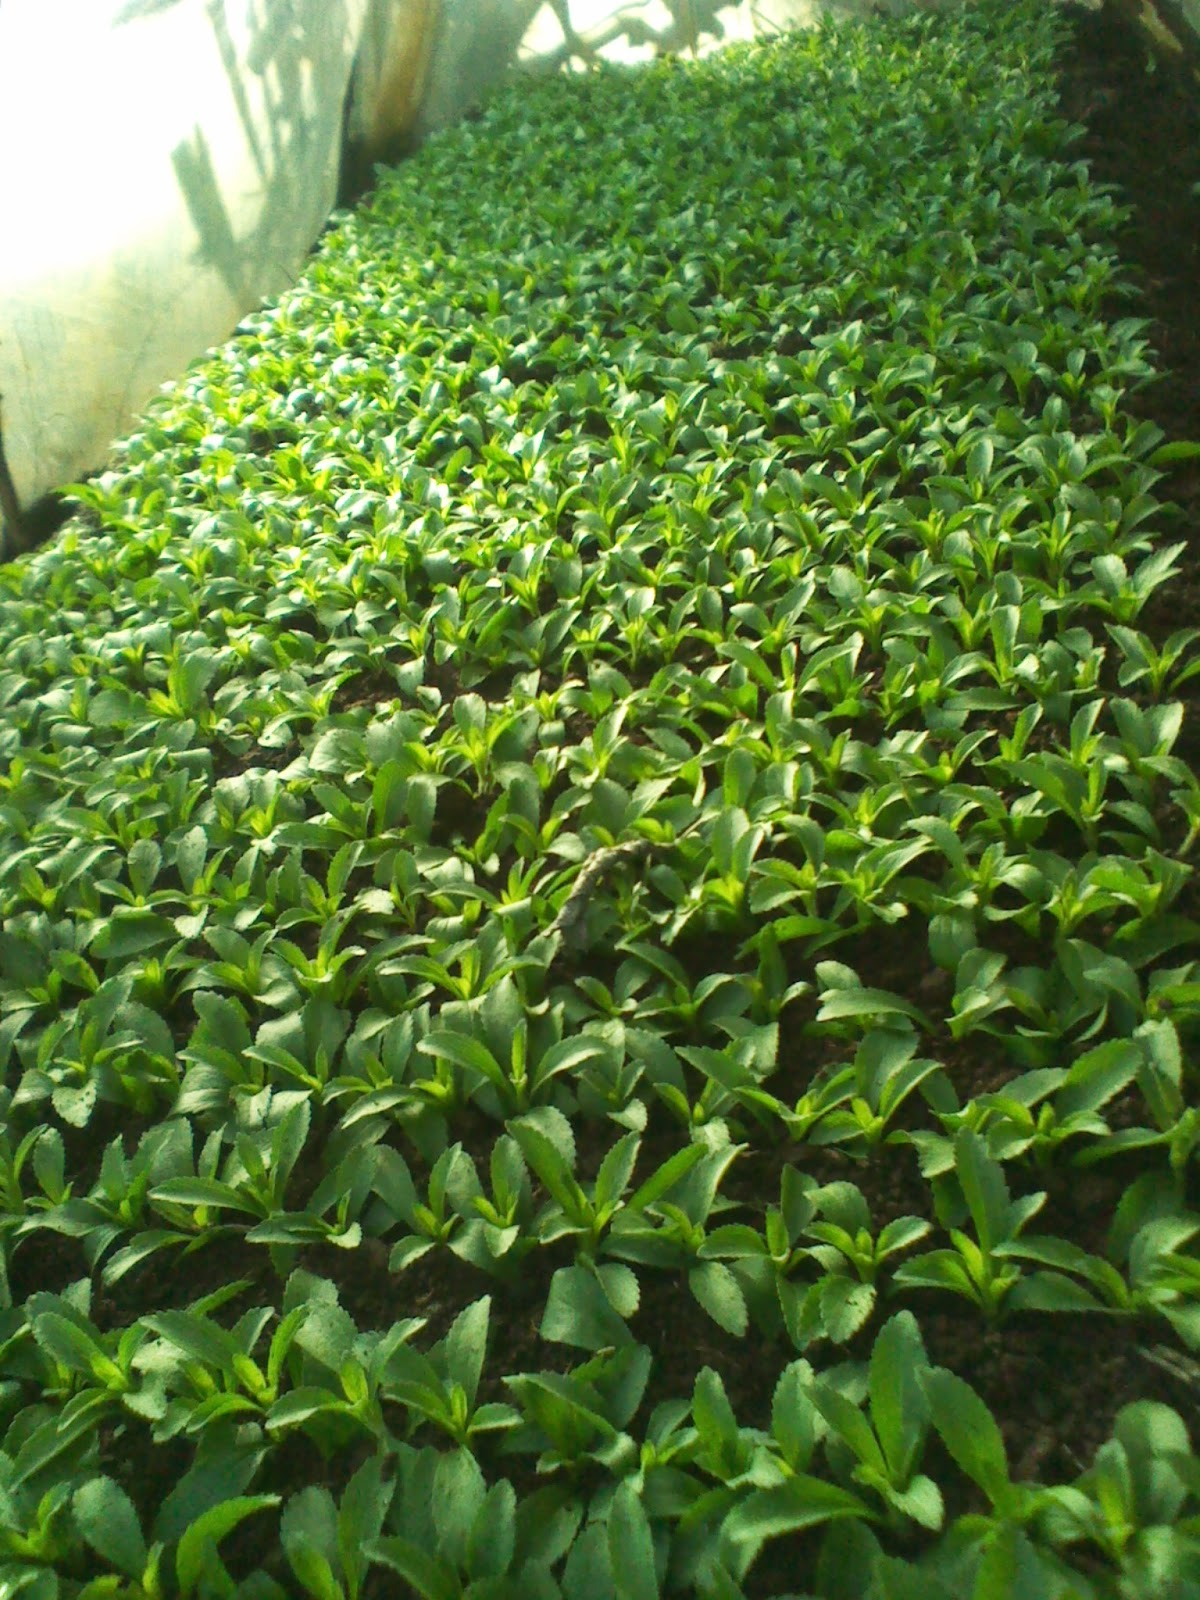 Growing Stevia How To Plant Grow And Harvest Stevia: KILIMO SASA: STEVIA GROWING IN KENYA